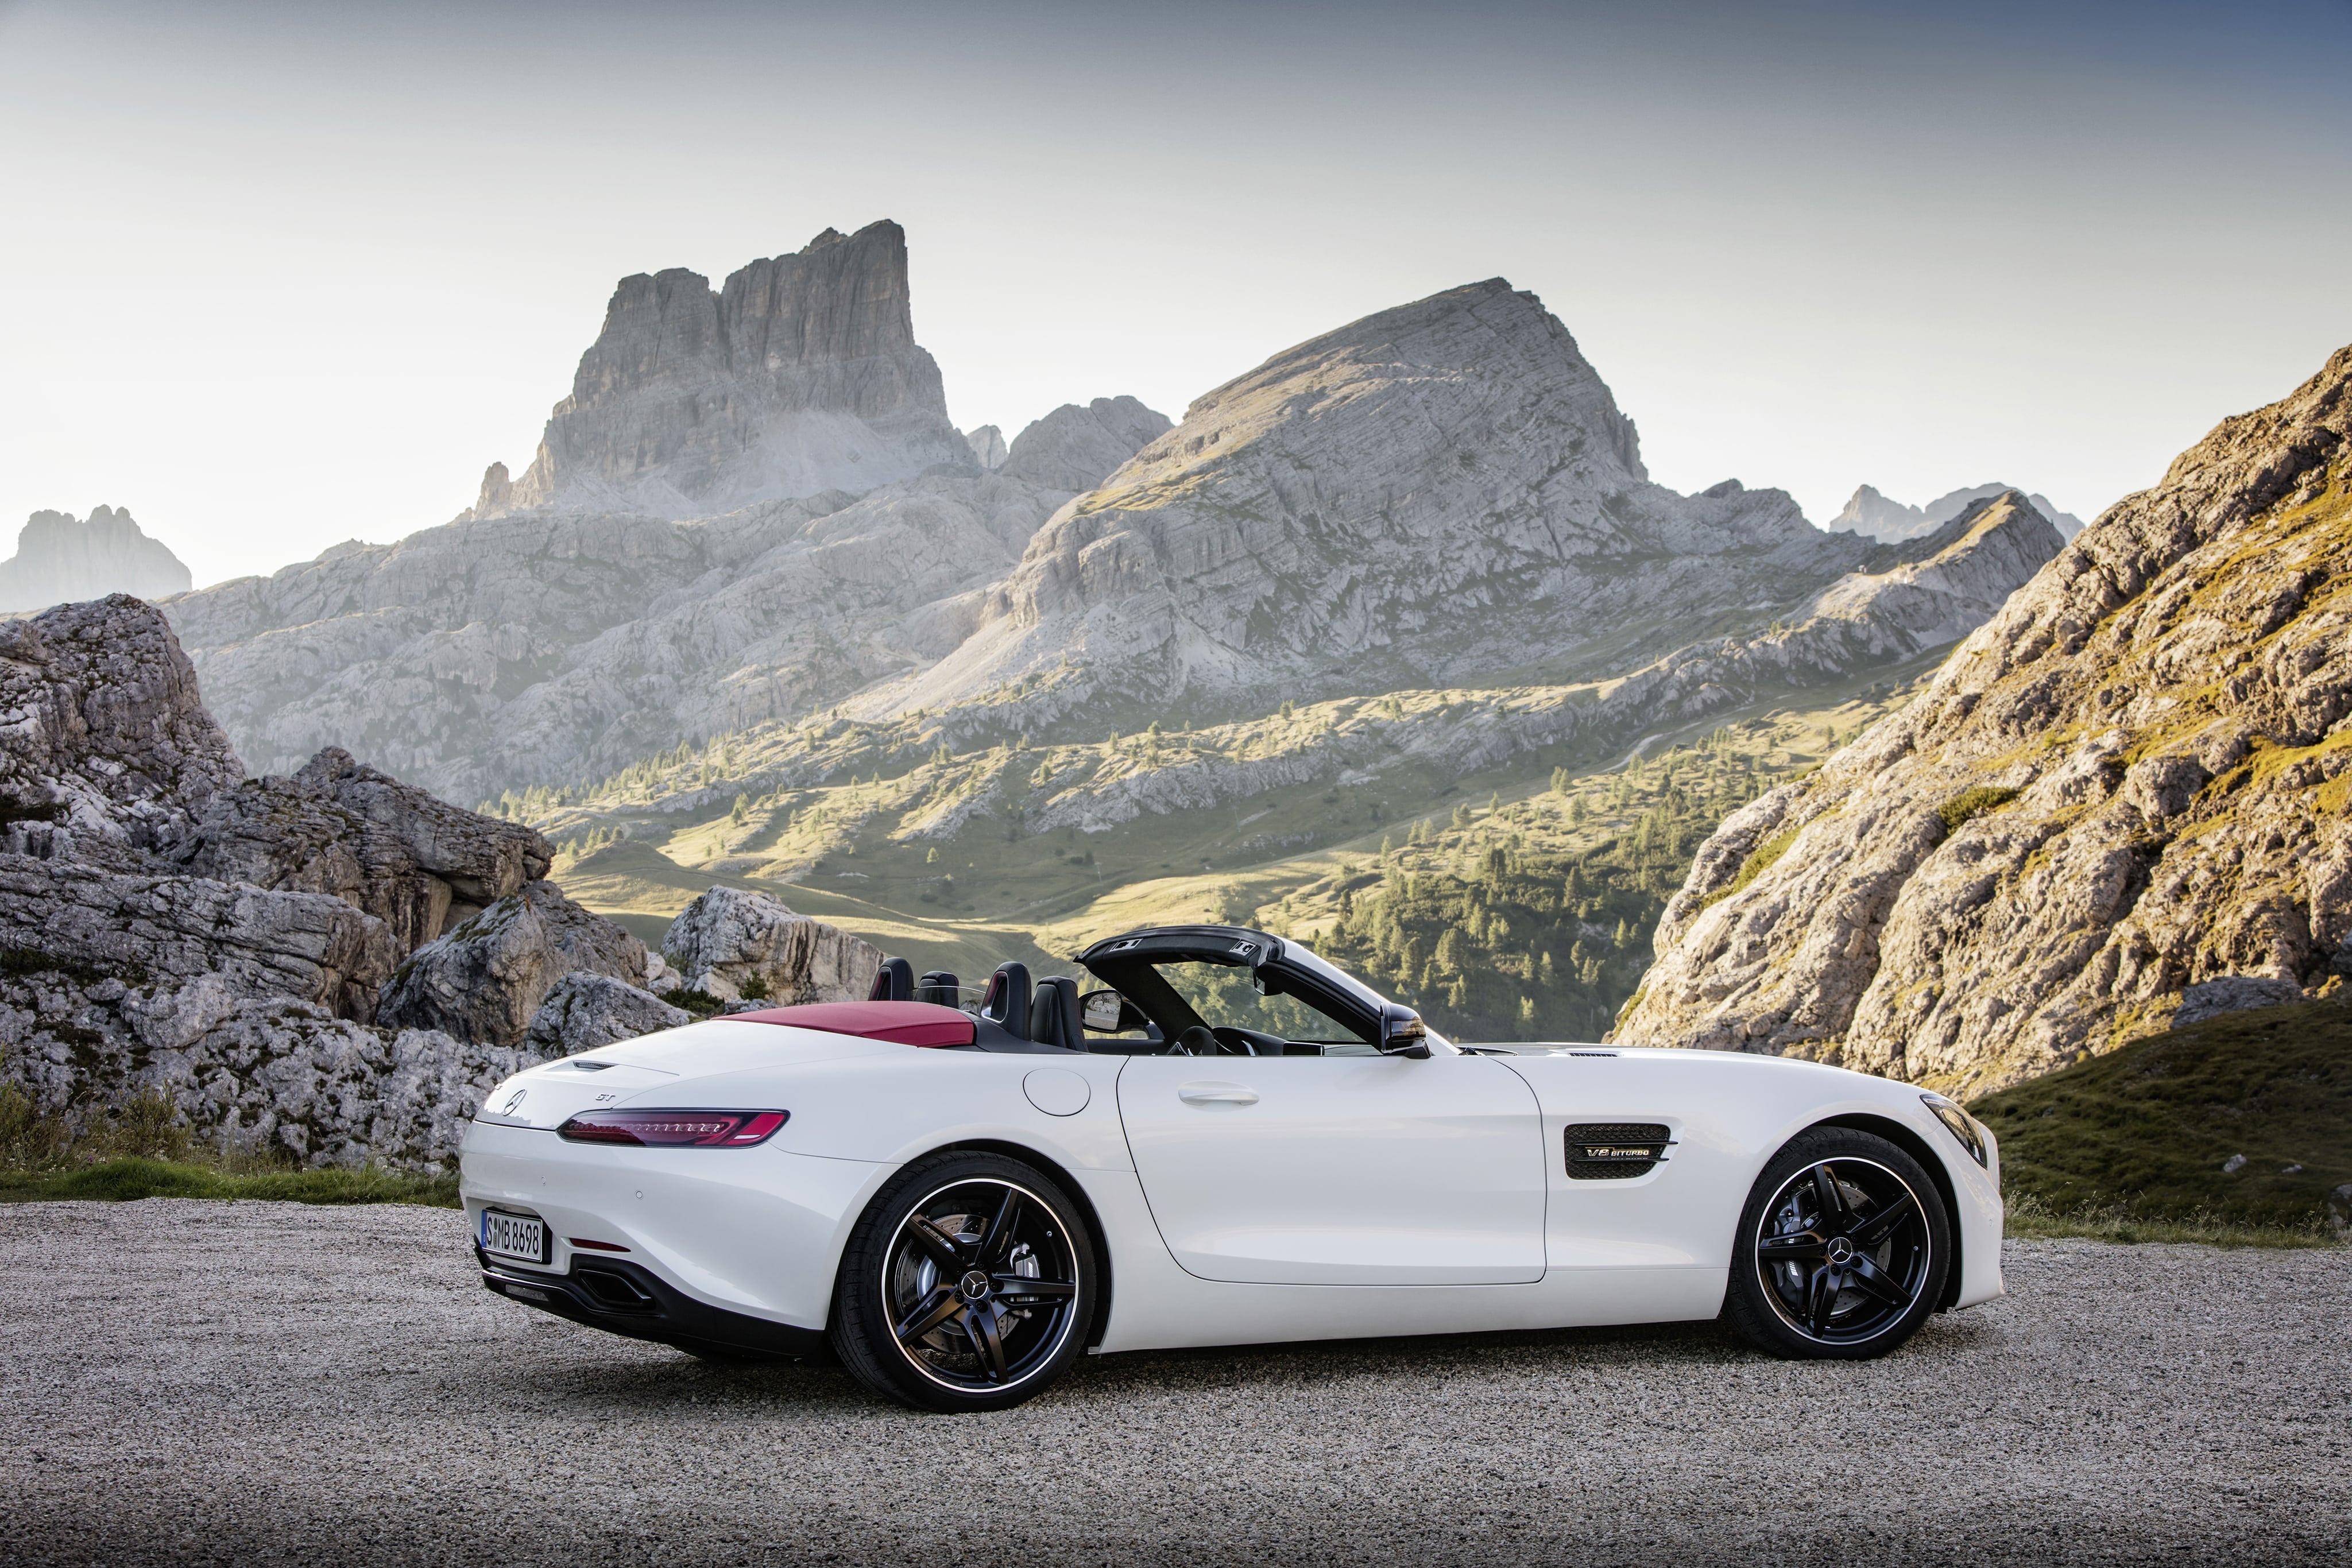 Mercedes-AMG GT Roadster Widescreen for desktop